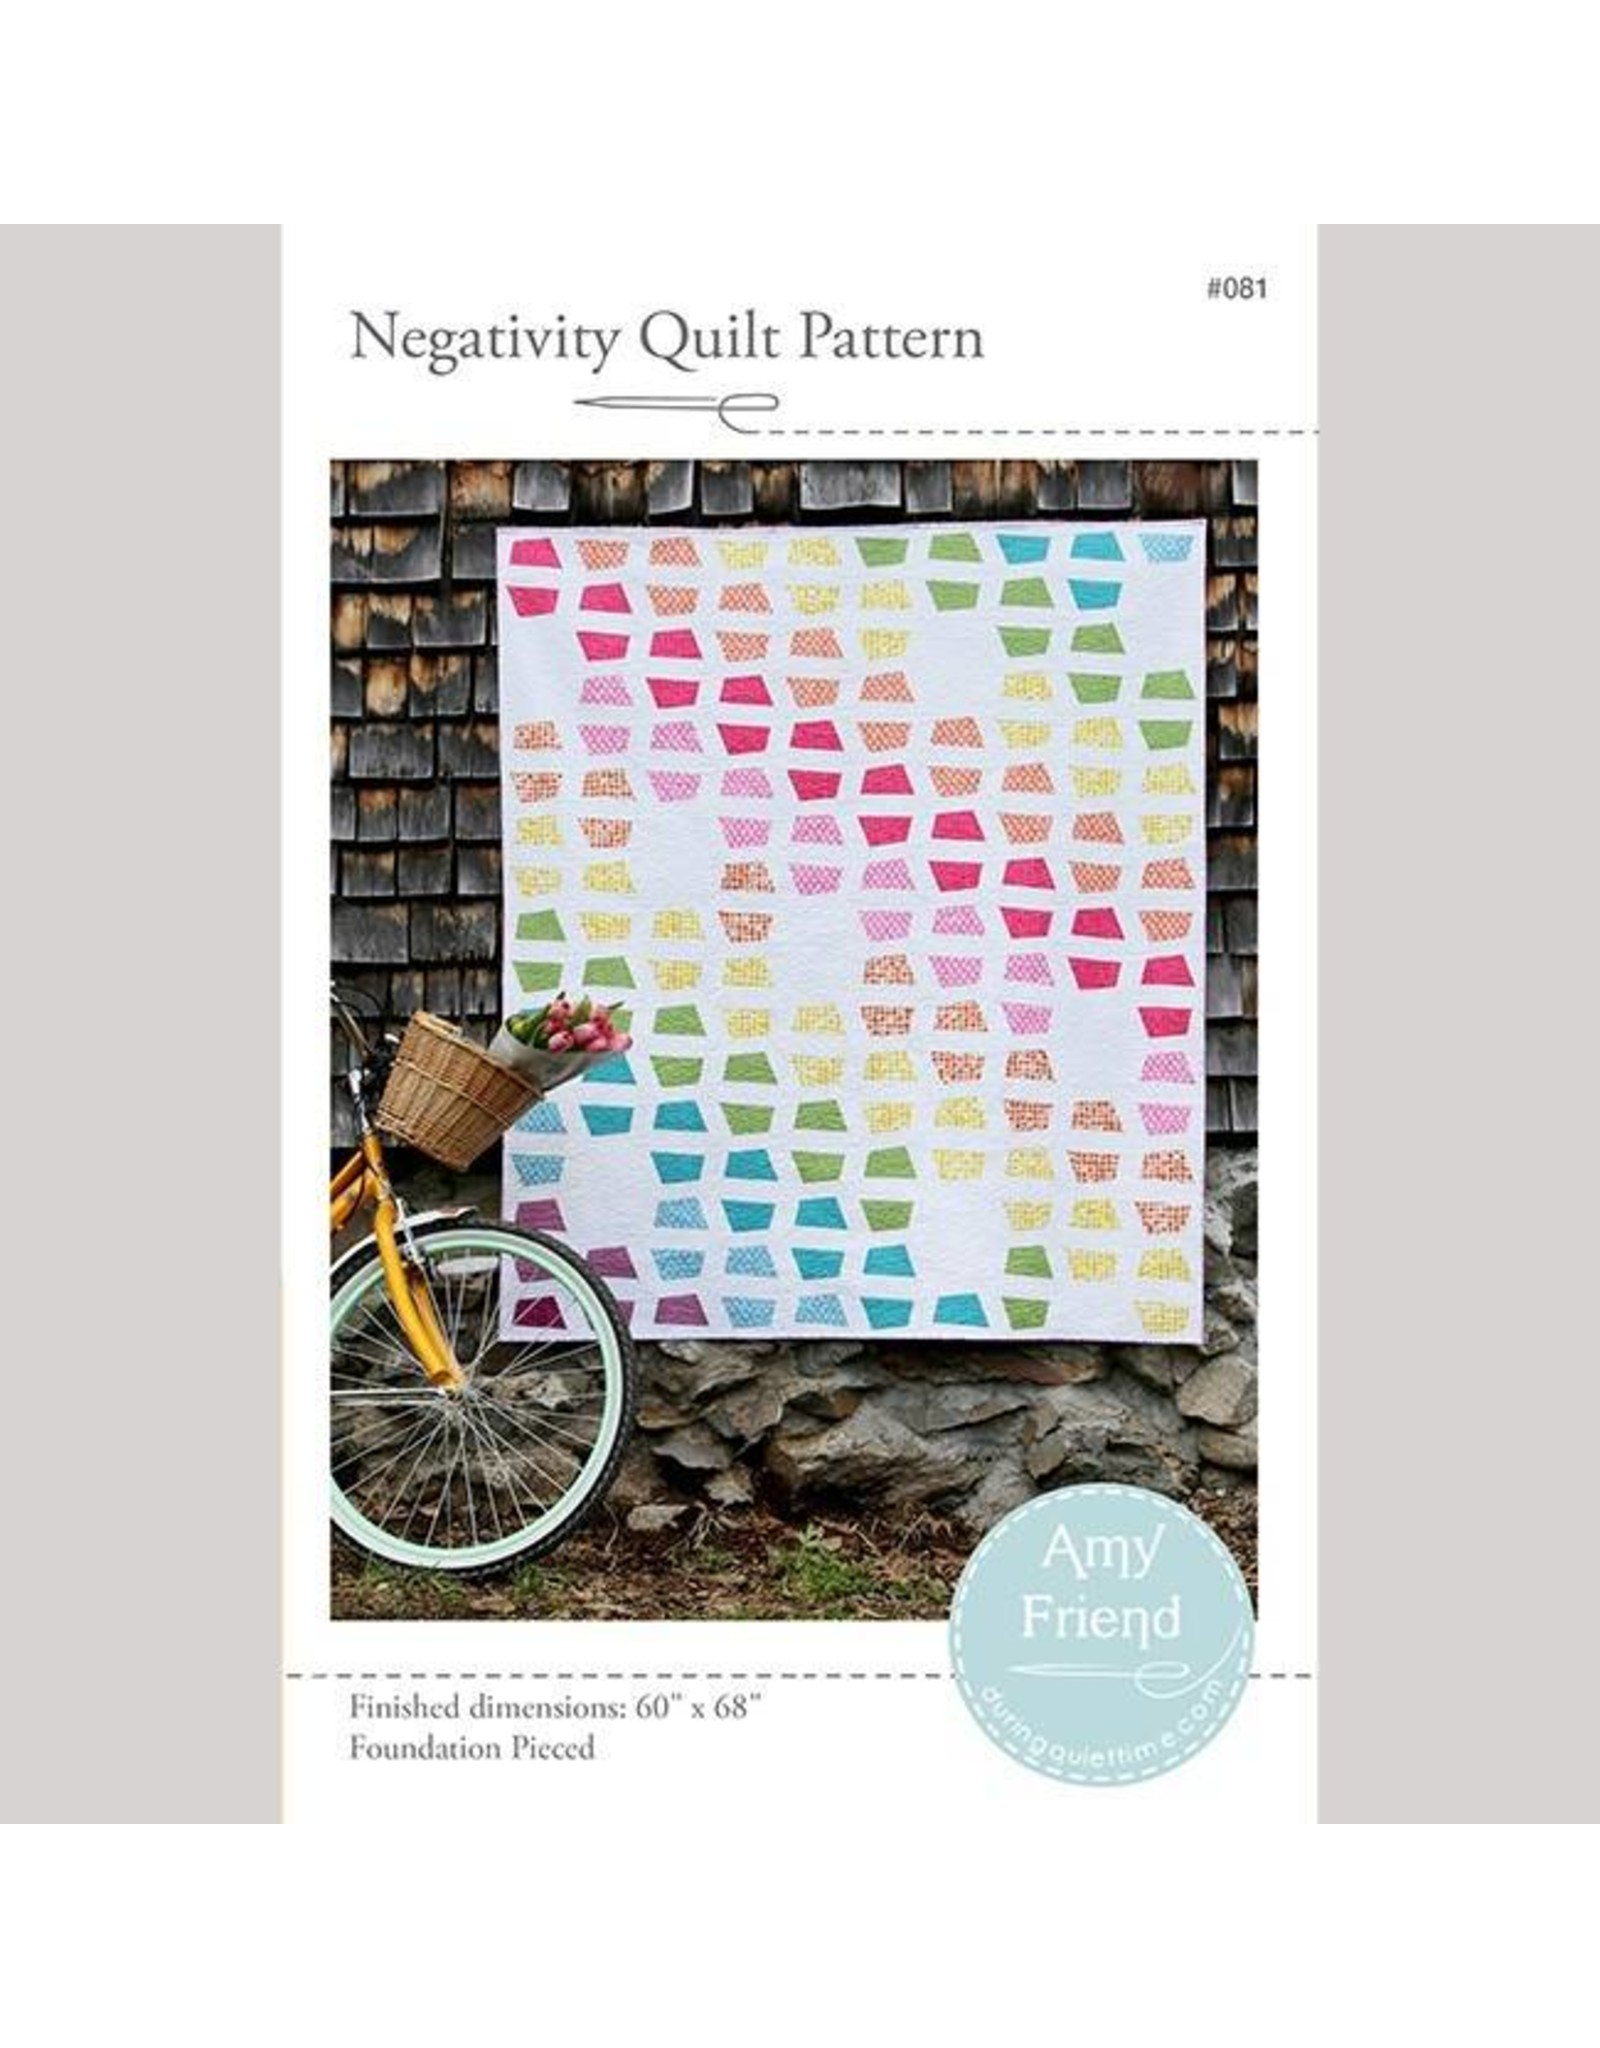 During Quiet Time Negativity Quilt